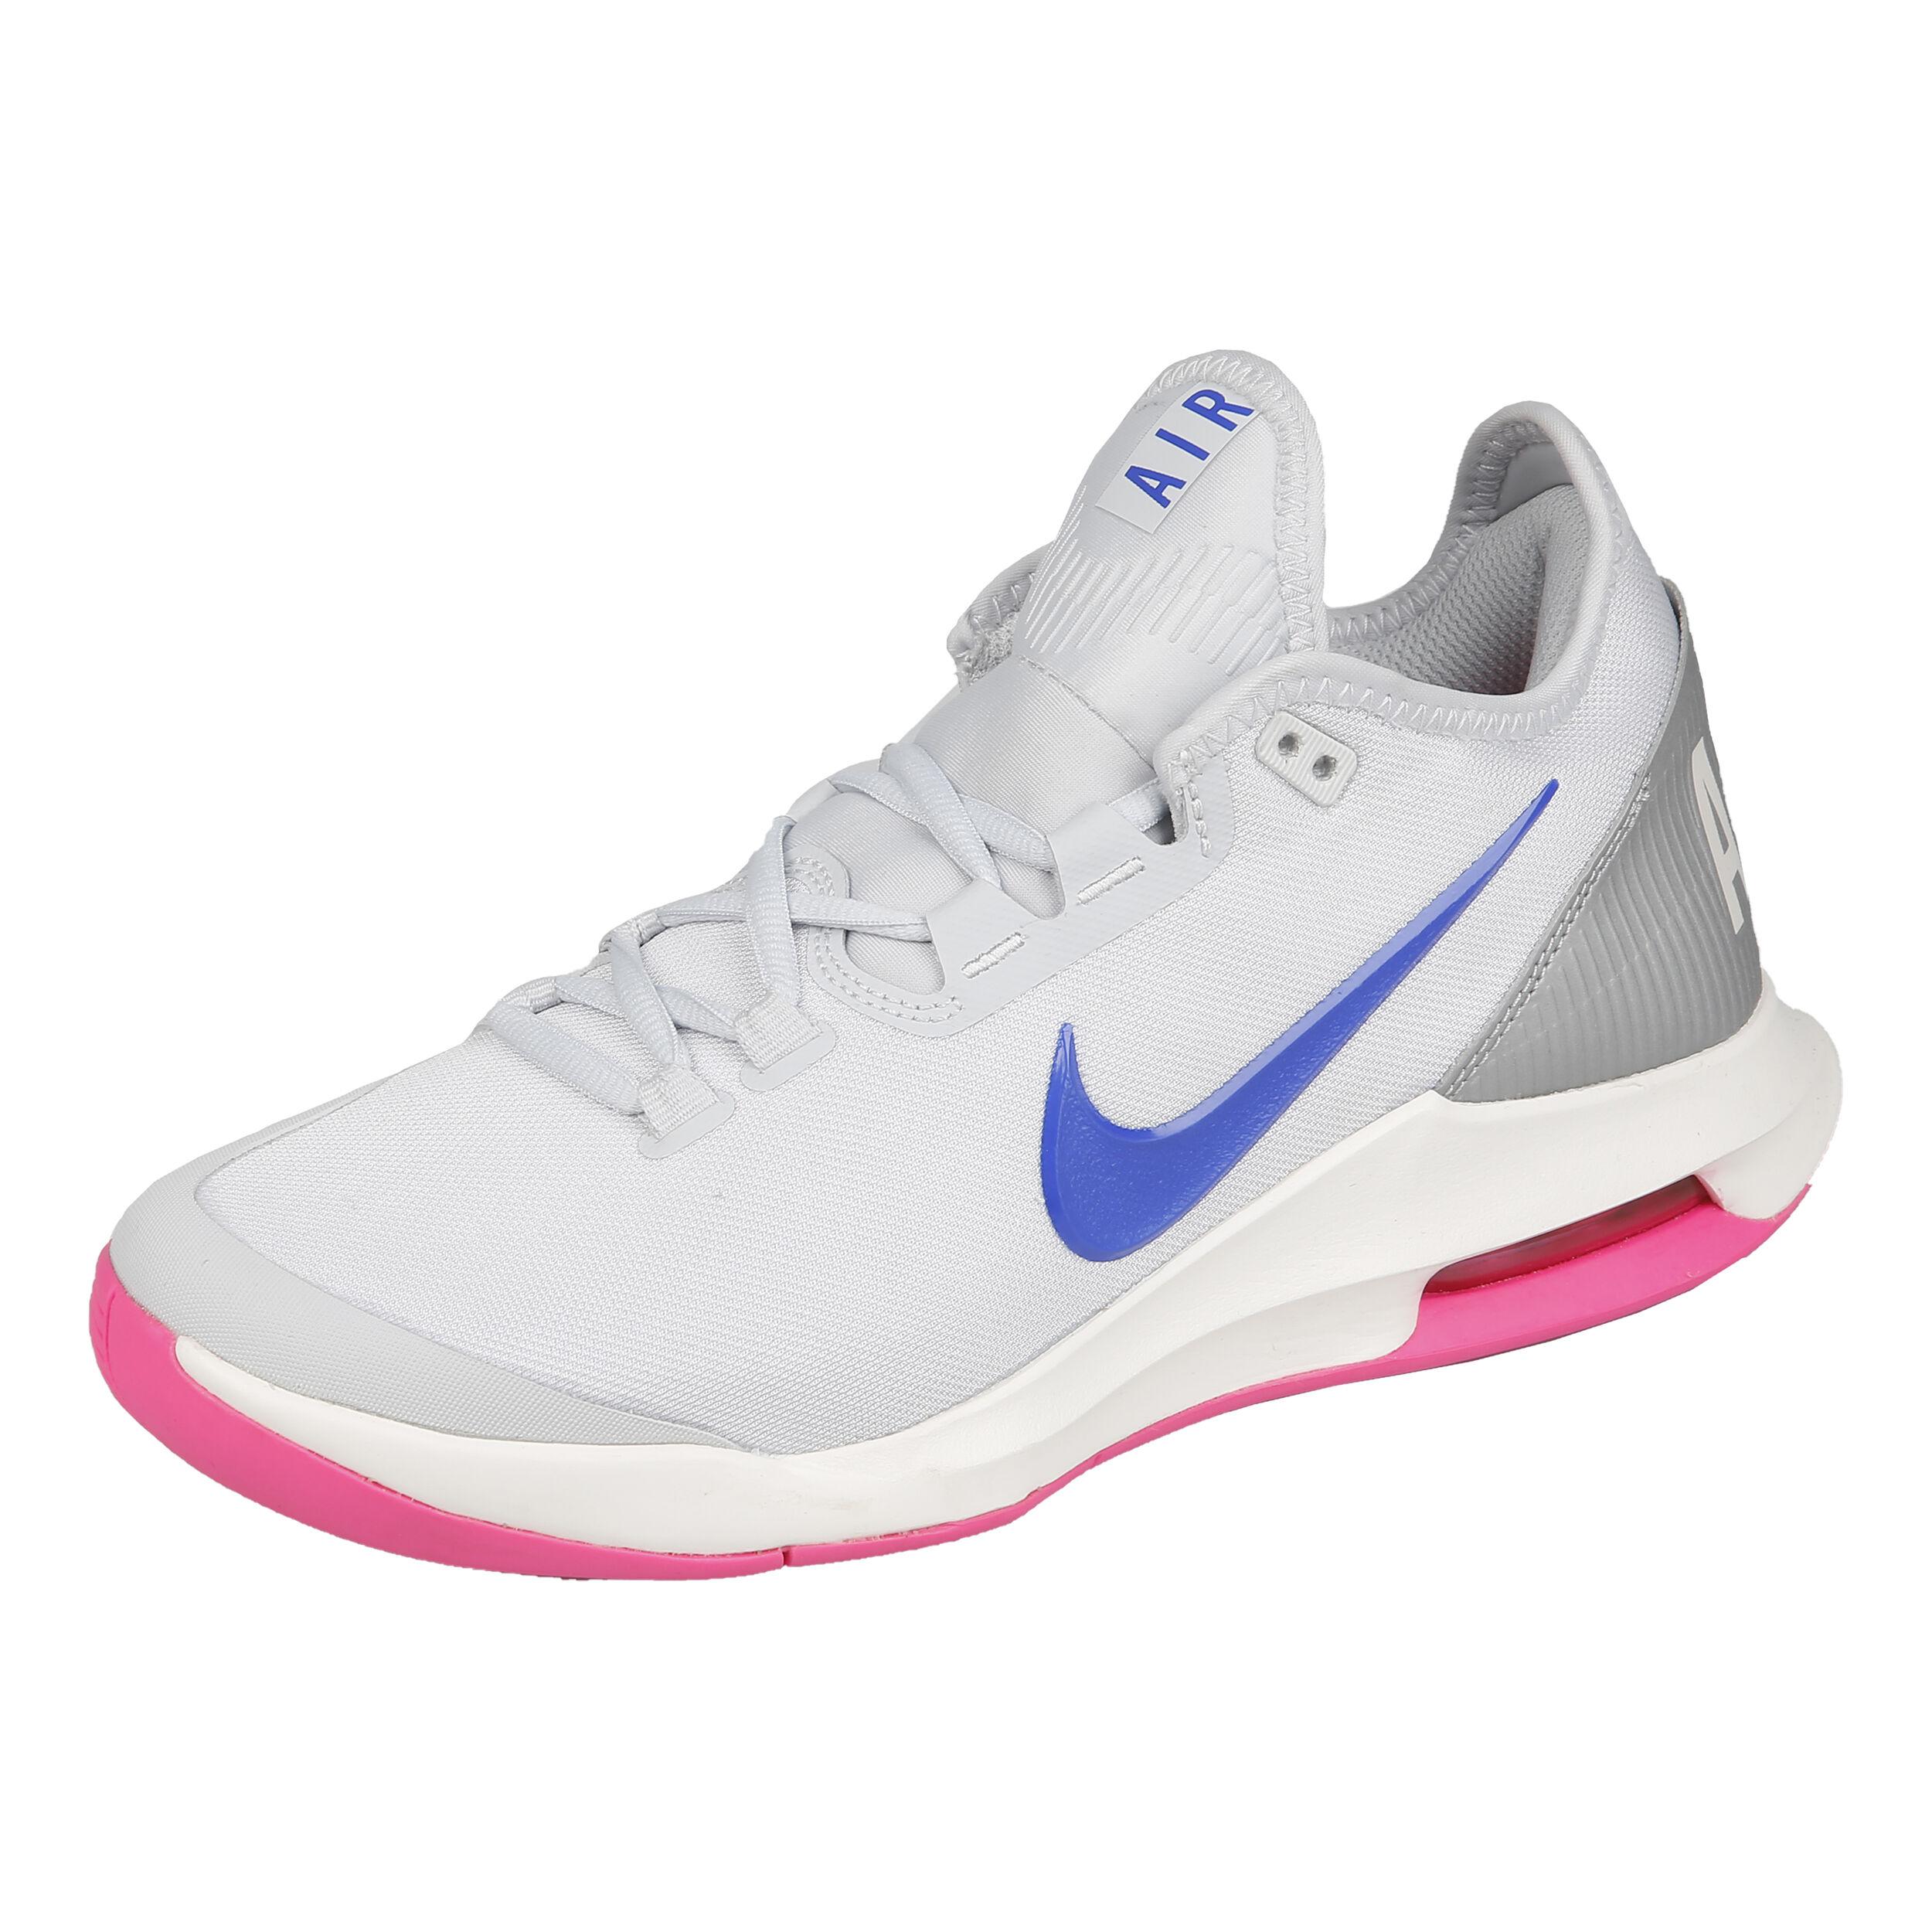 Nike Air Max Wildcard Tennisschuhe günstig online kaufen